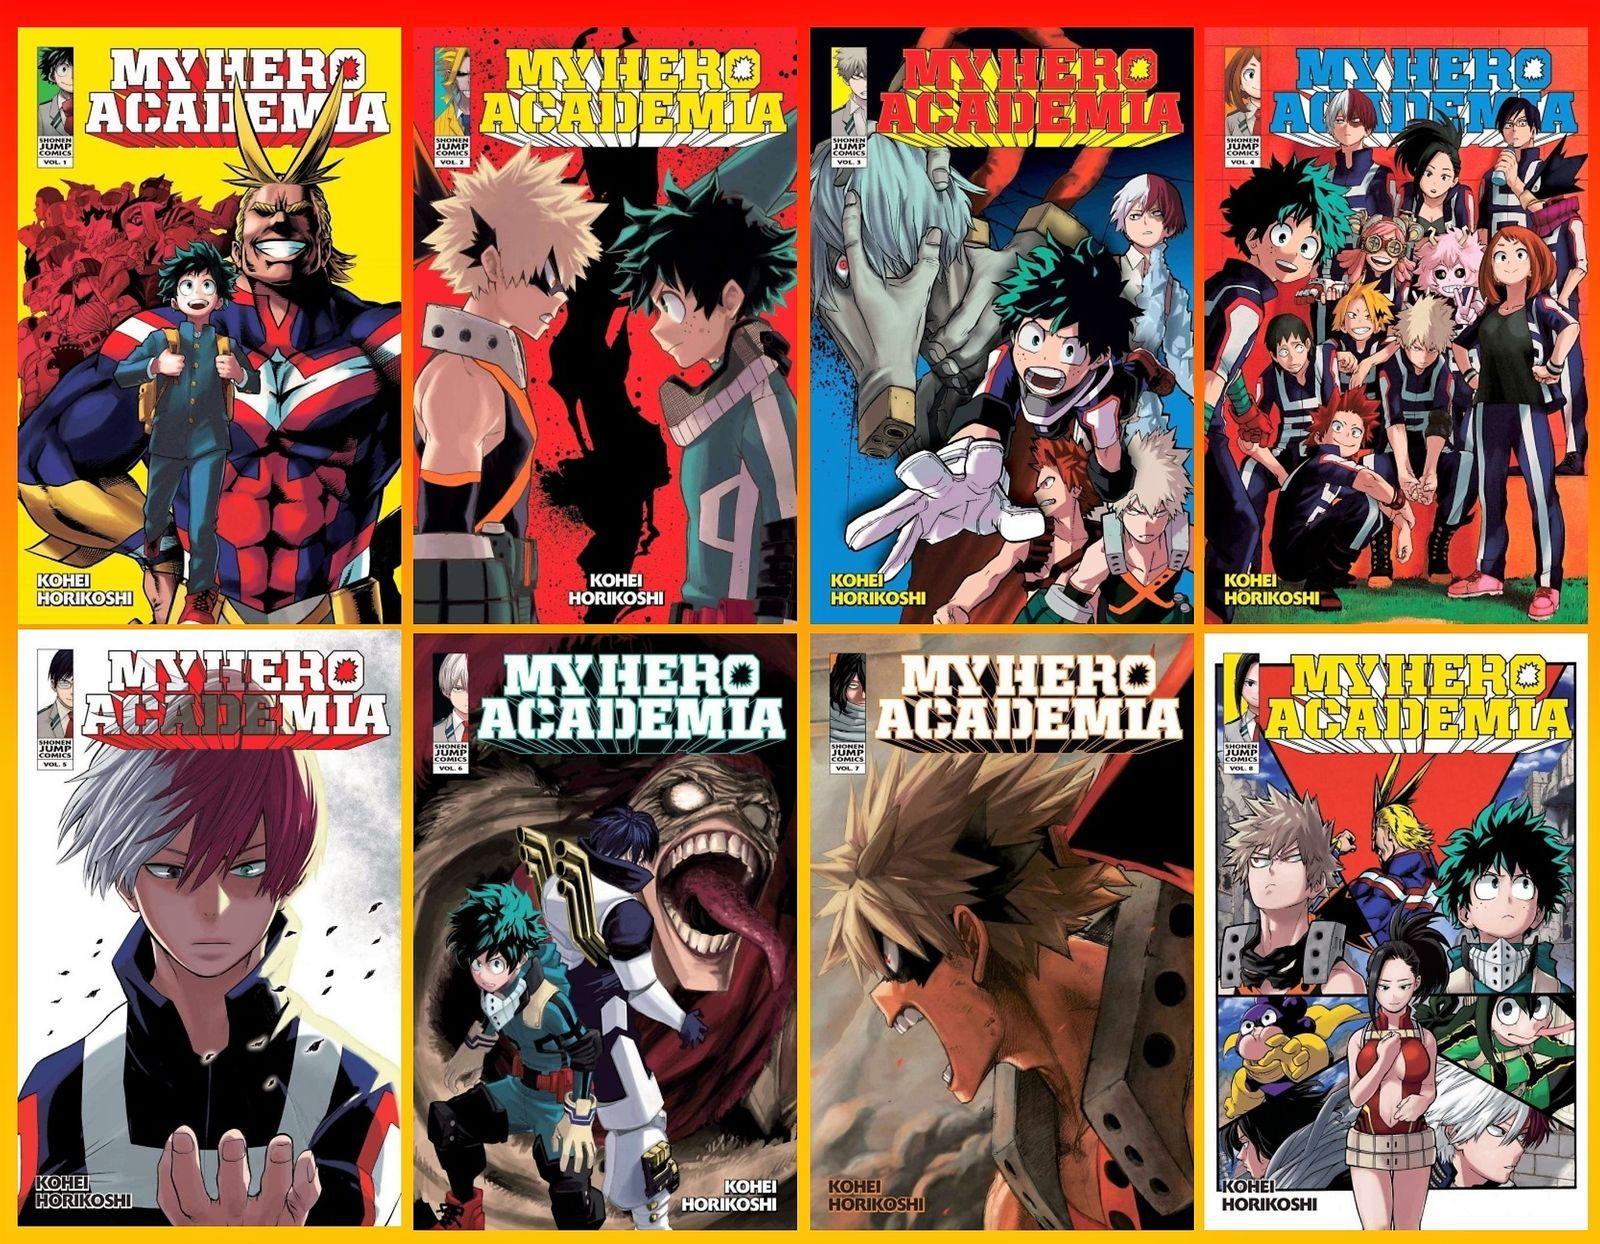 My Hero Academia Series English Manga Collection Set 1 8 Paperback Brand New My Hero Academia Manga Collection My Hero